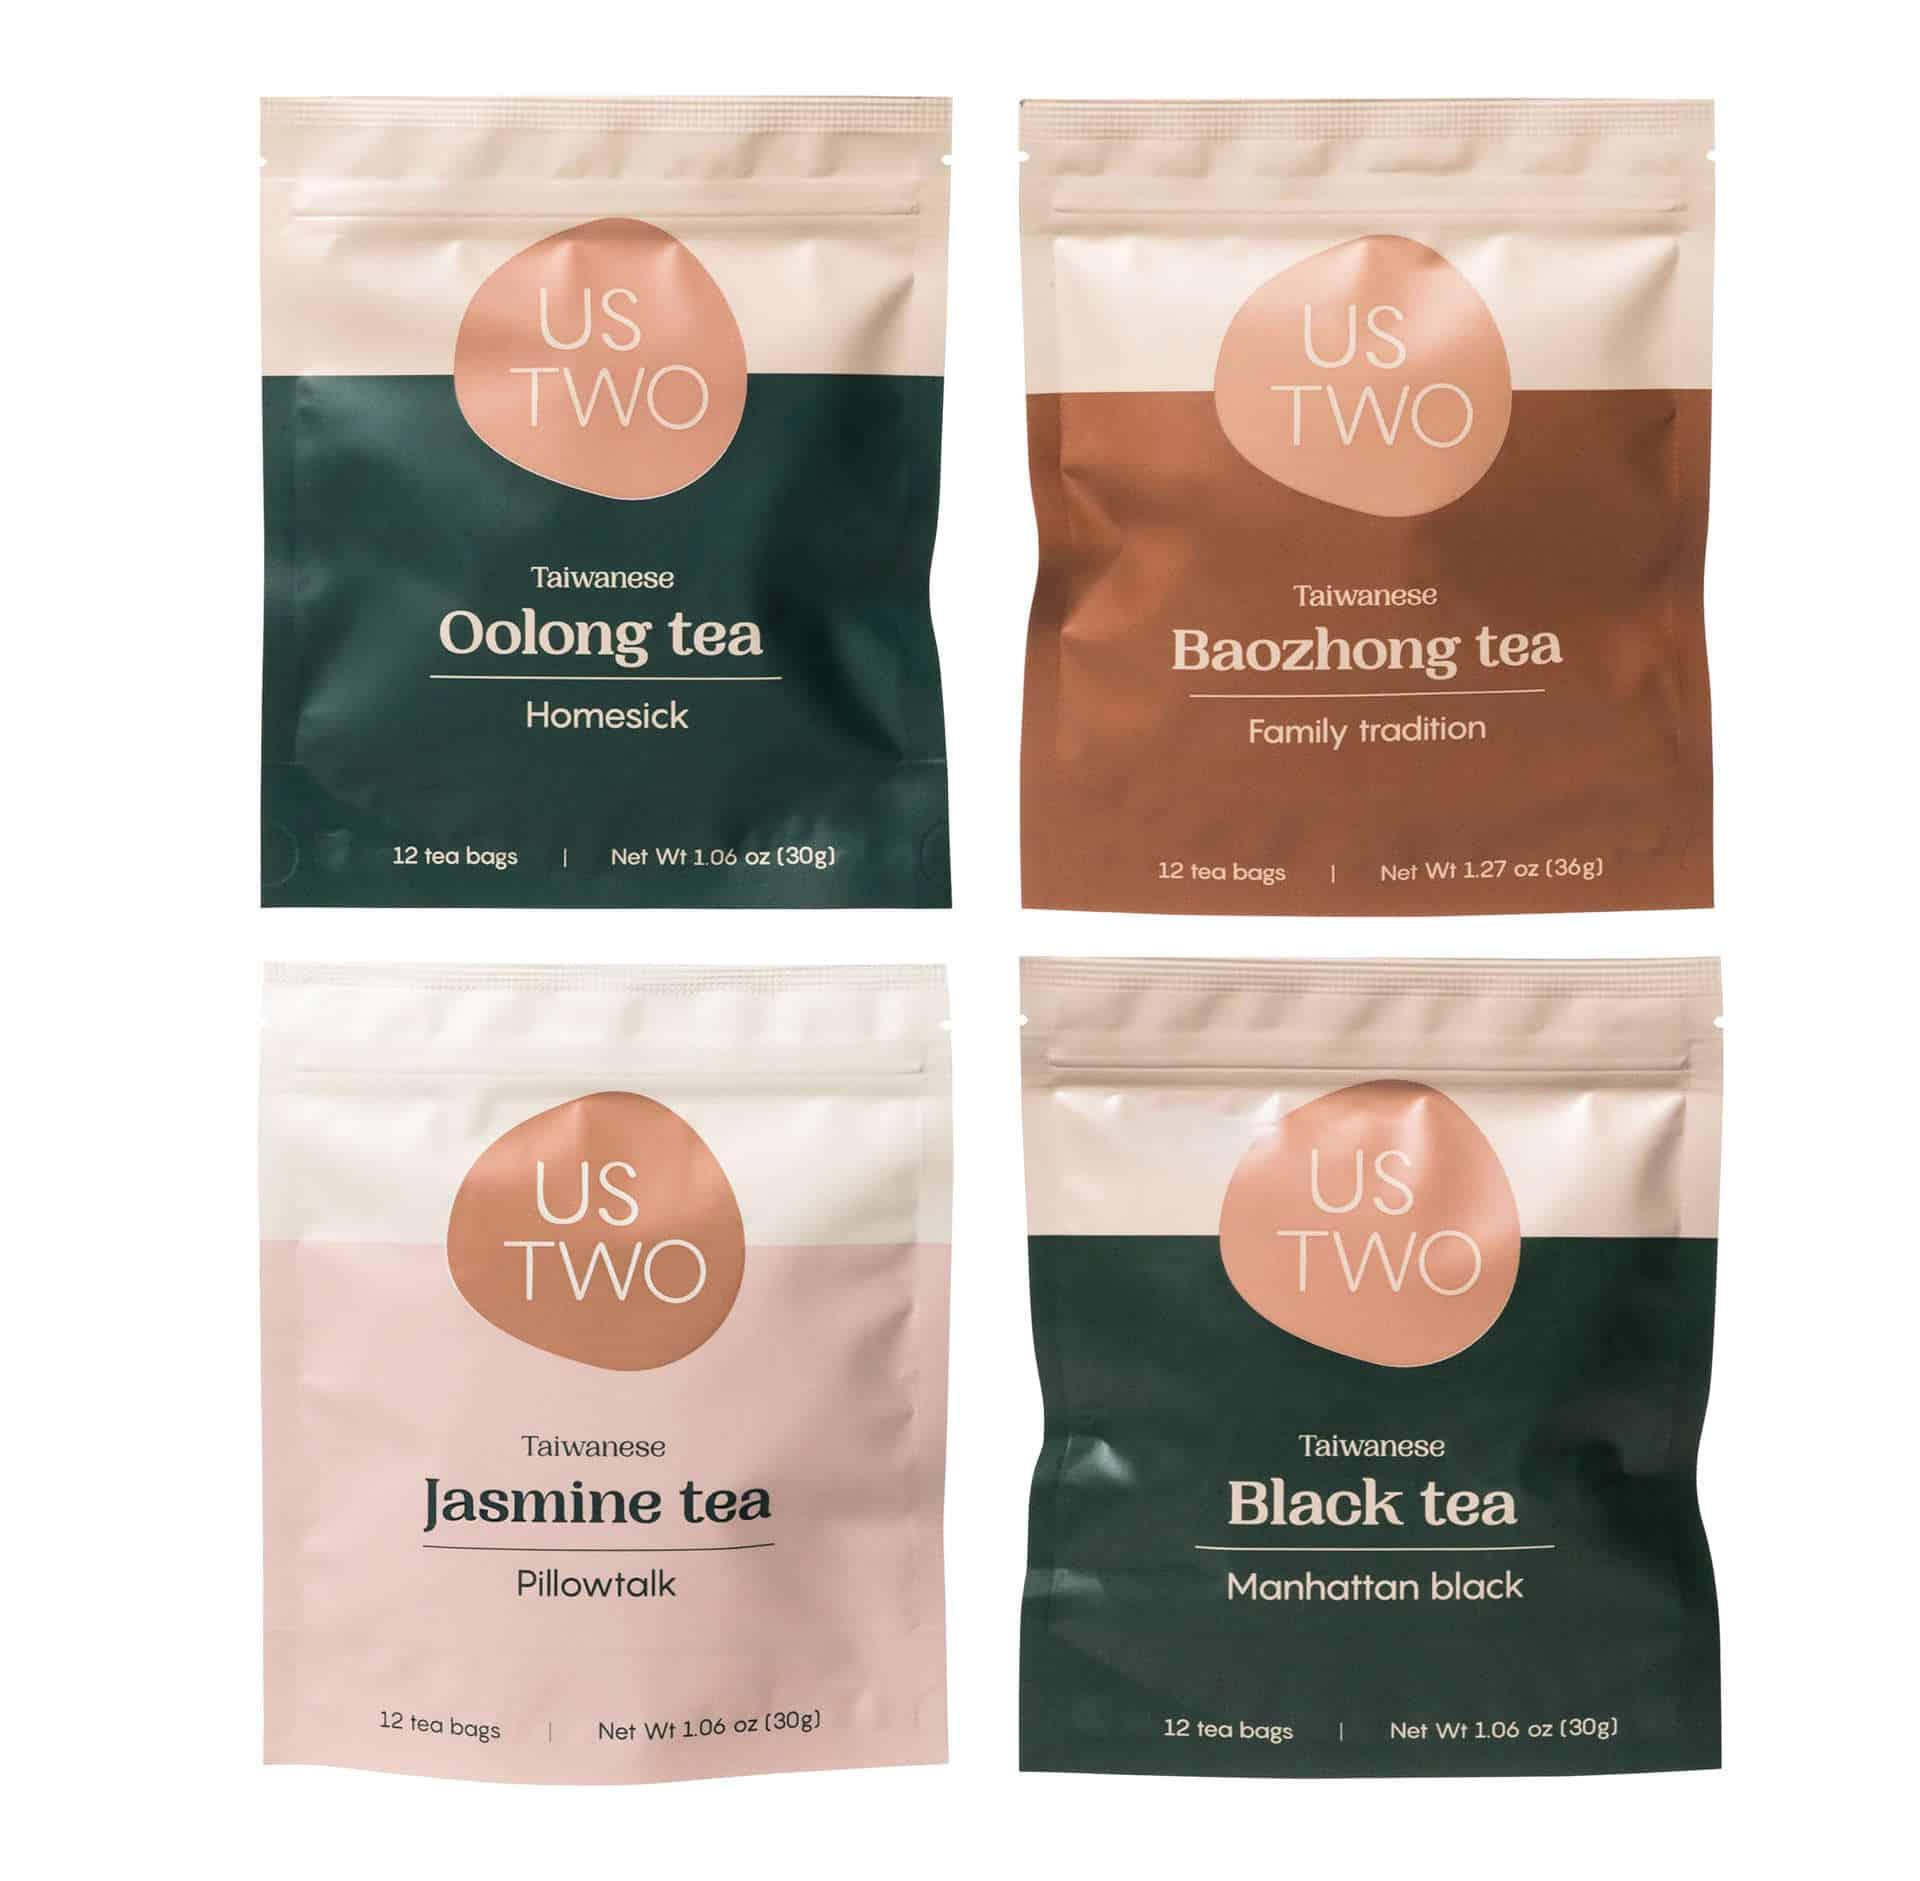 Maggie Xue - Us Two Tea Packaging